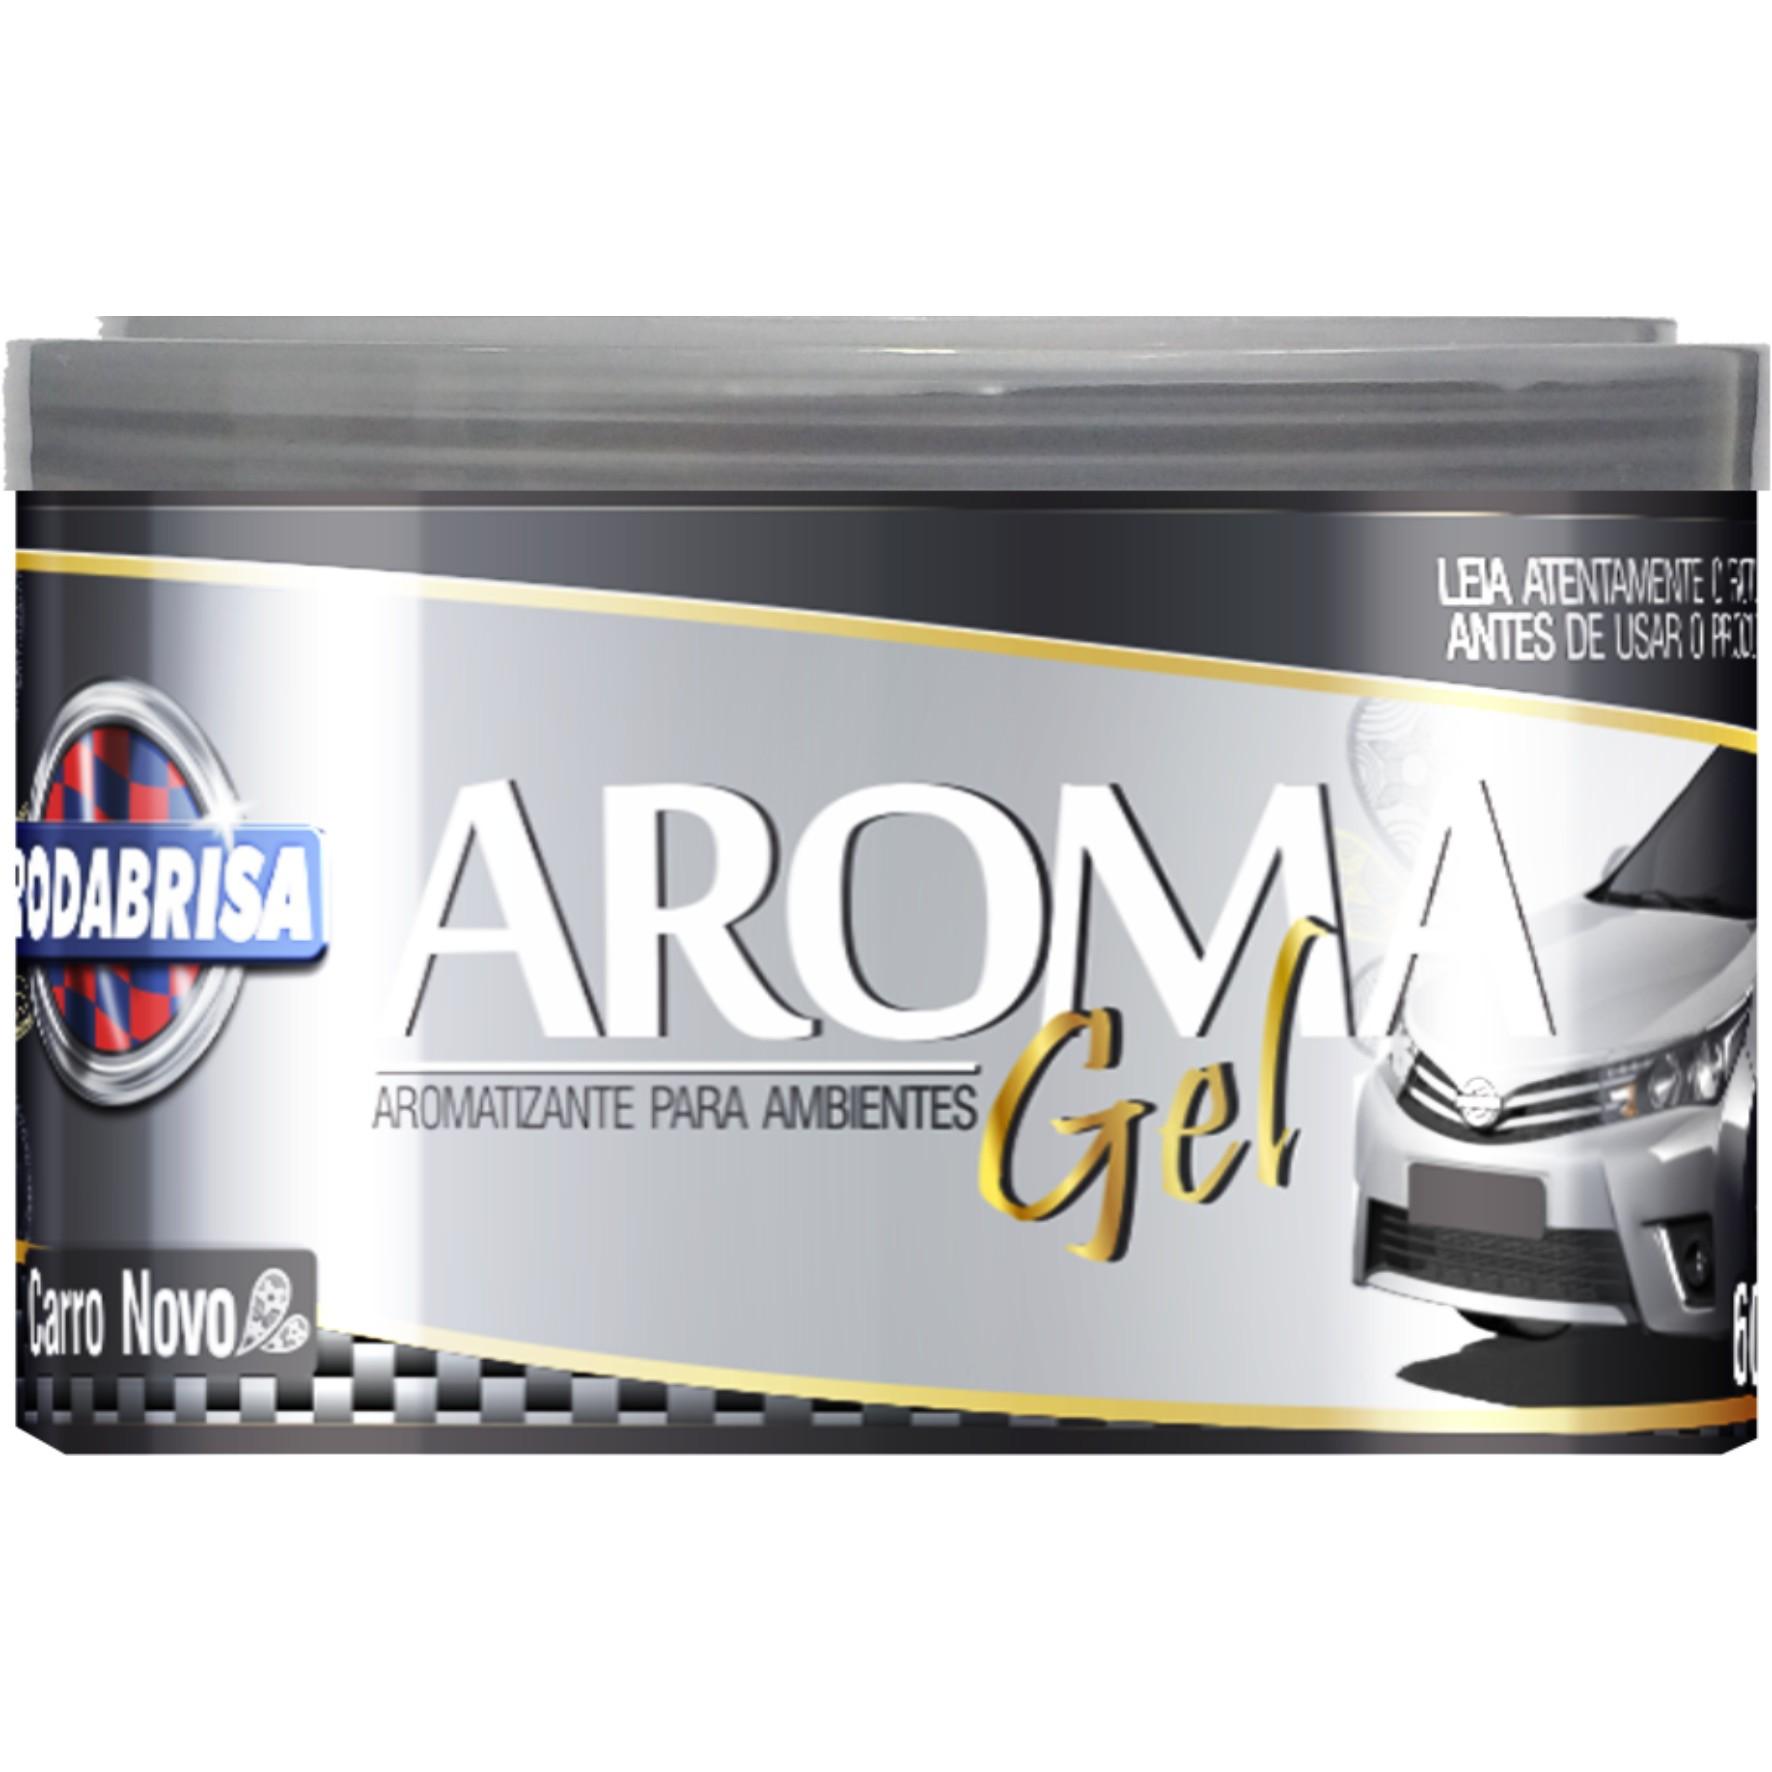 Aromatizante Gel Fragrancia Carro Novo 60 g - 13108 - Rodabrill